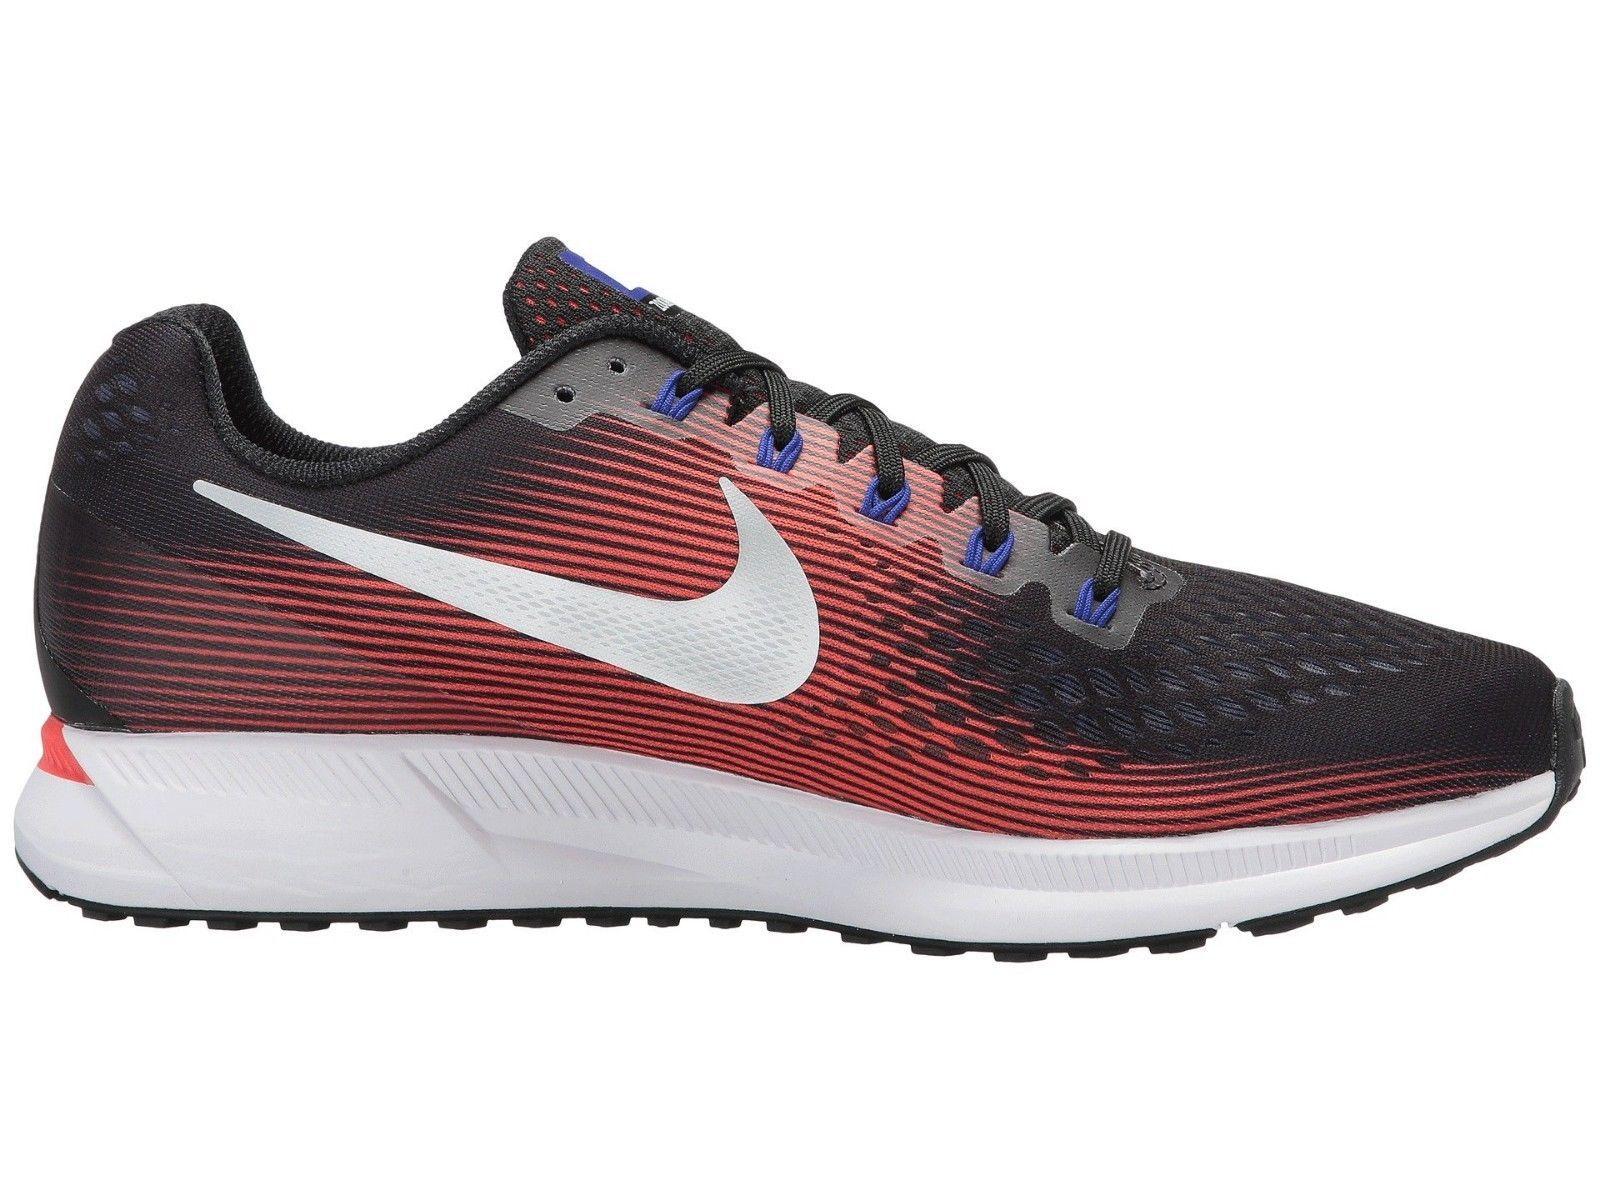 differently b25cd 7e618 Men s Nike Zoom Pegasus 34 Running Shoes, 880555 006 Multi Sizes Black Met  Silve